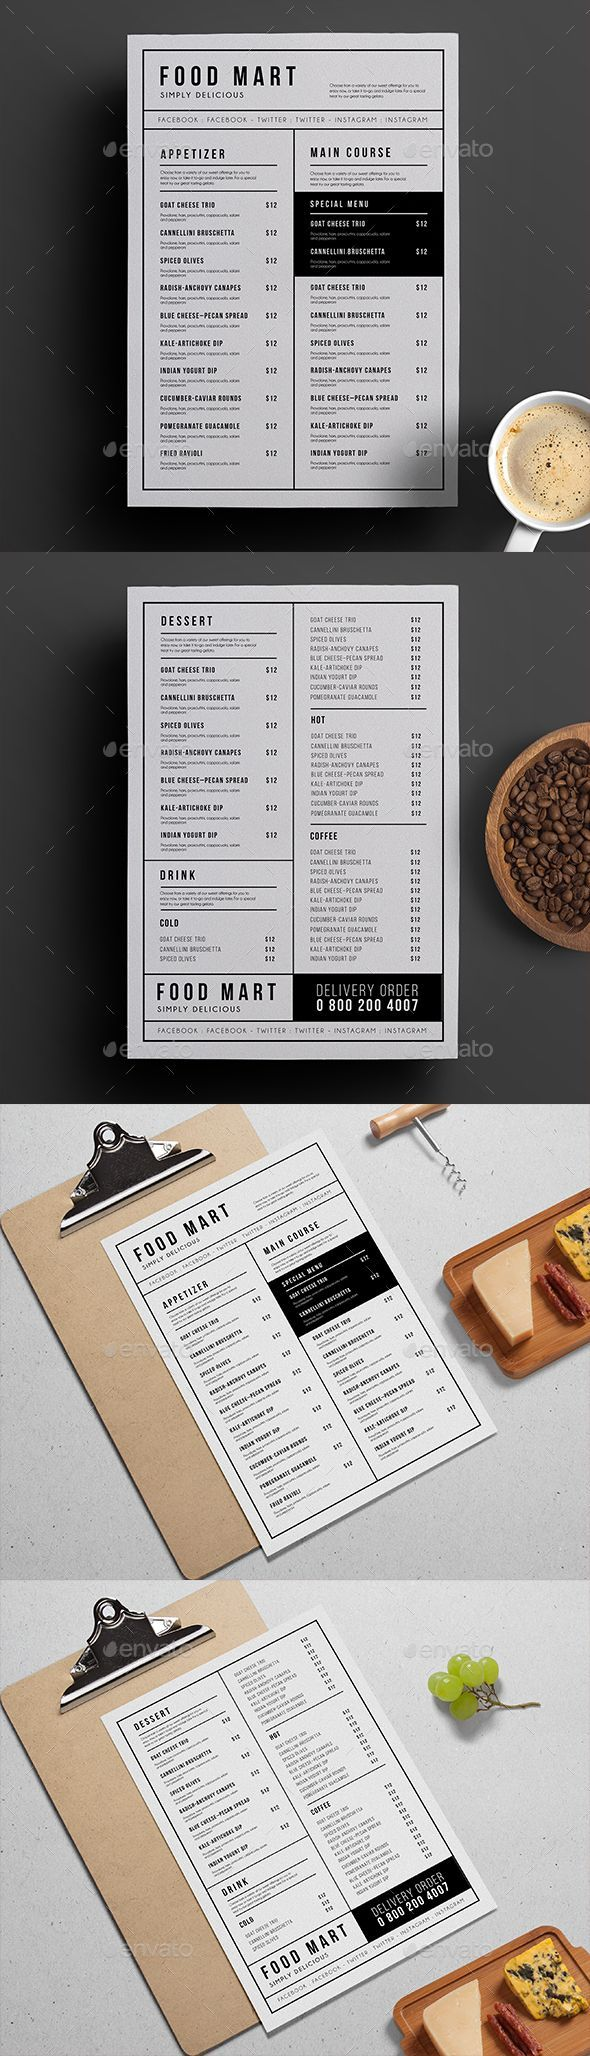 Simple Restaurant Menu — Photoshop PSD #steak #wood • Download ➝ https://graphicriver.net/item/simple-restaurant-menu/19172738?ref=pxcr